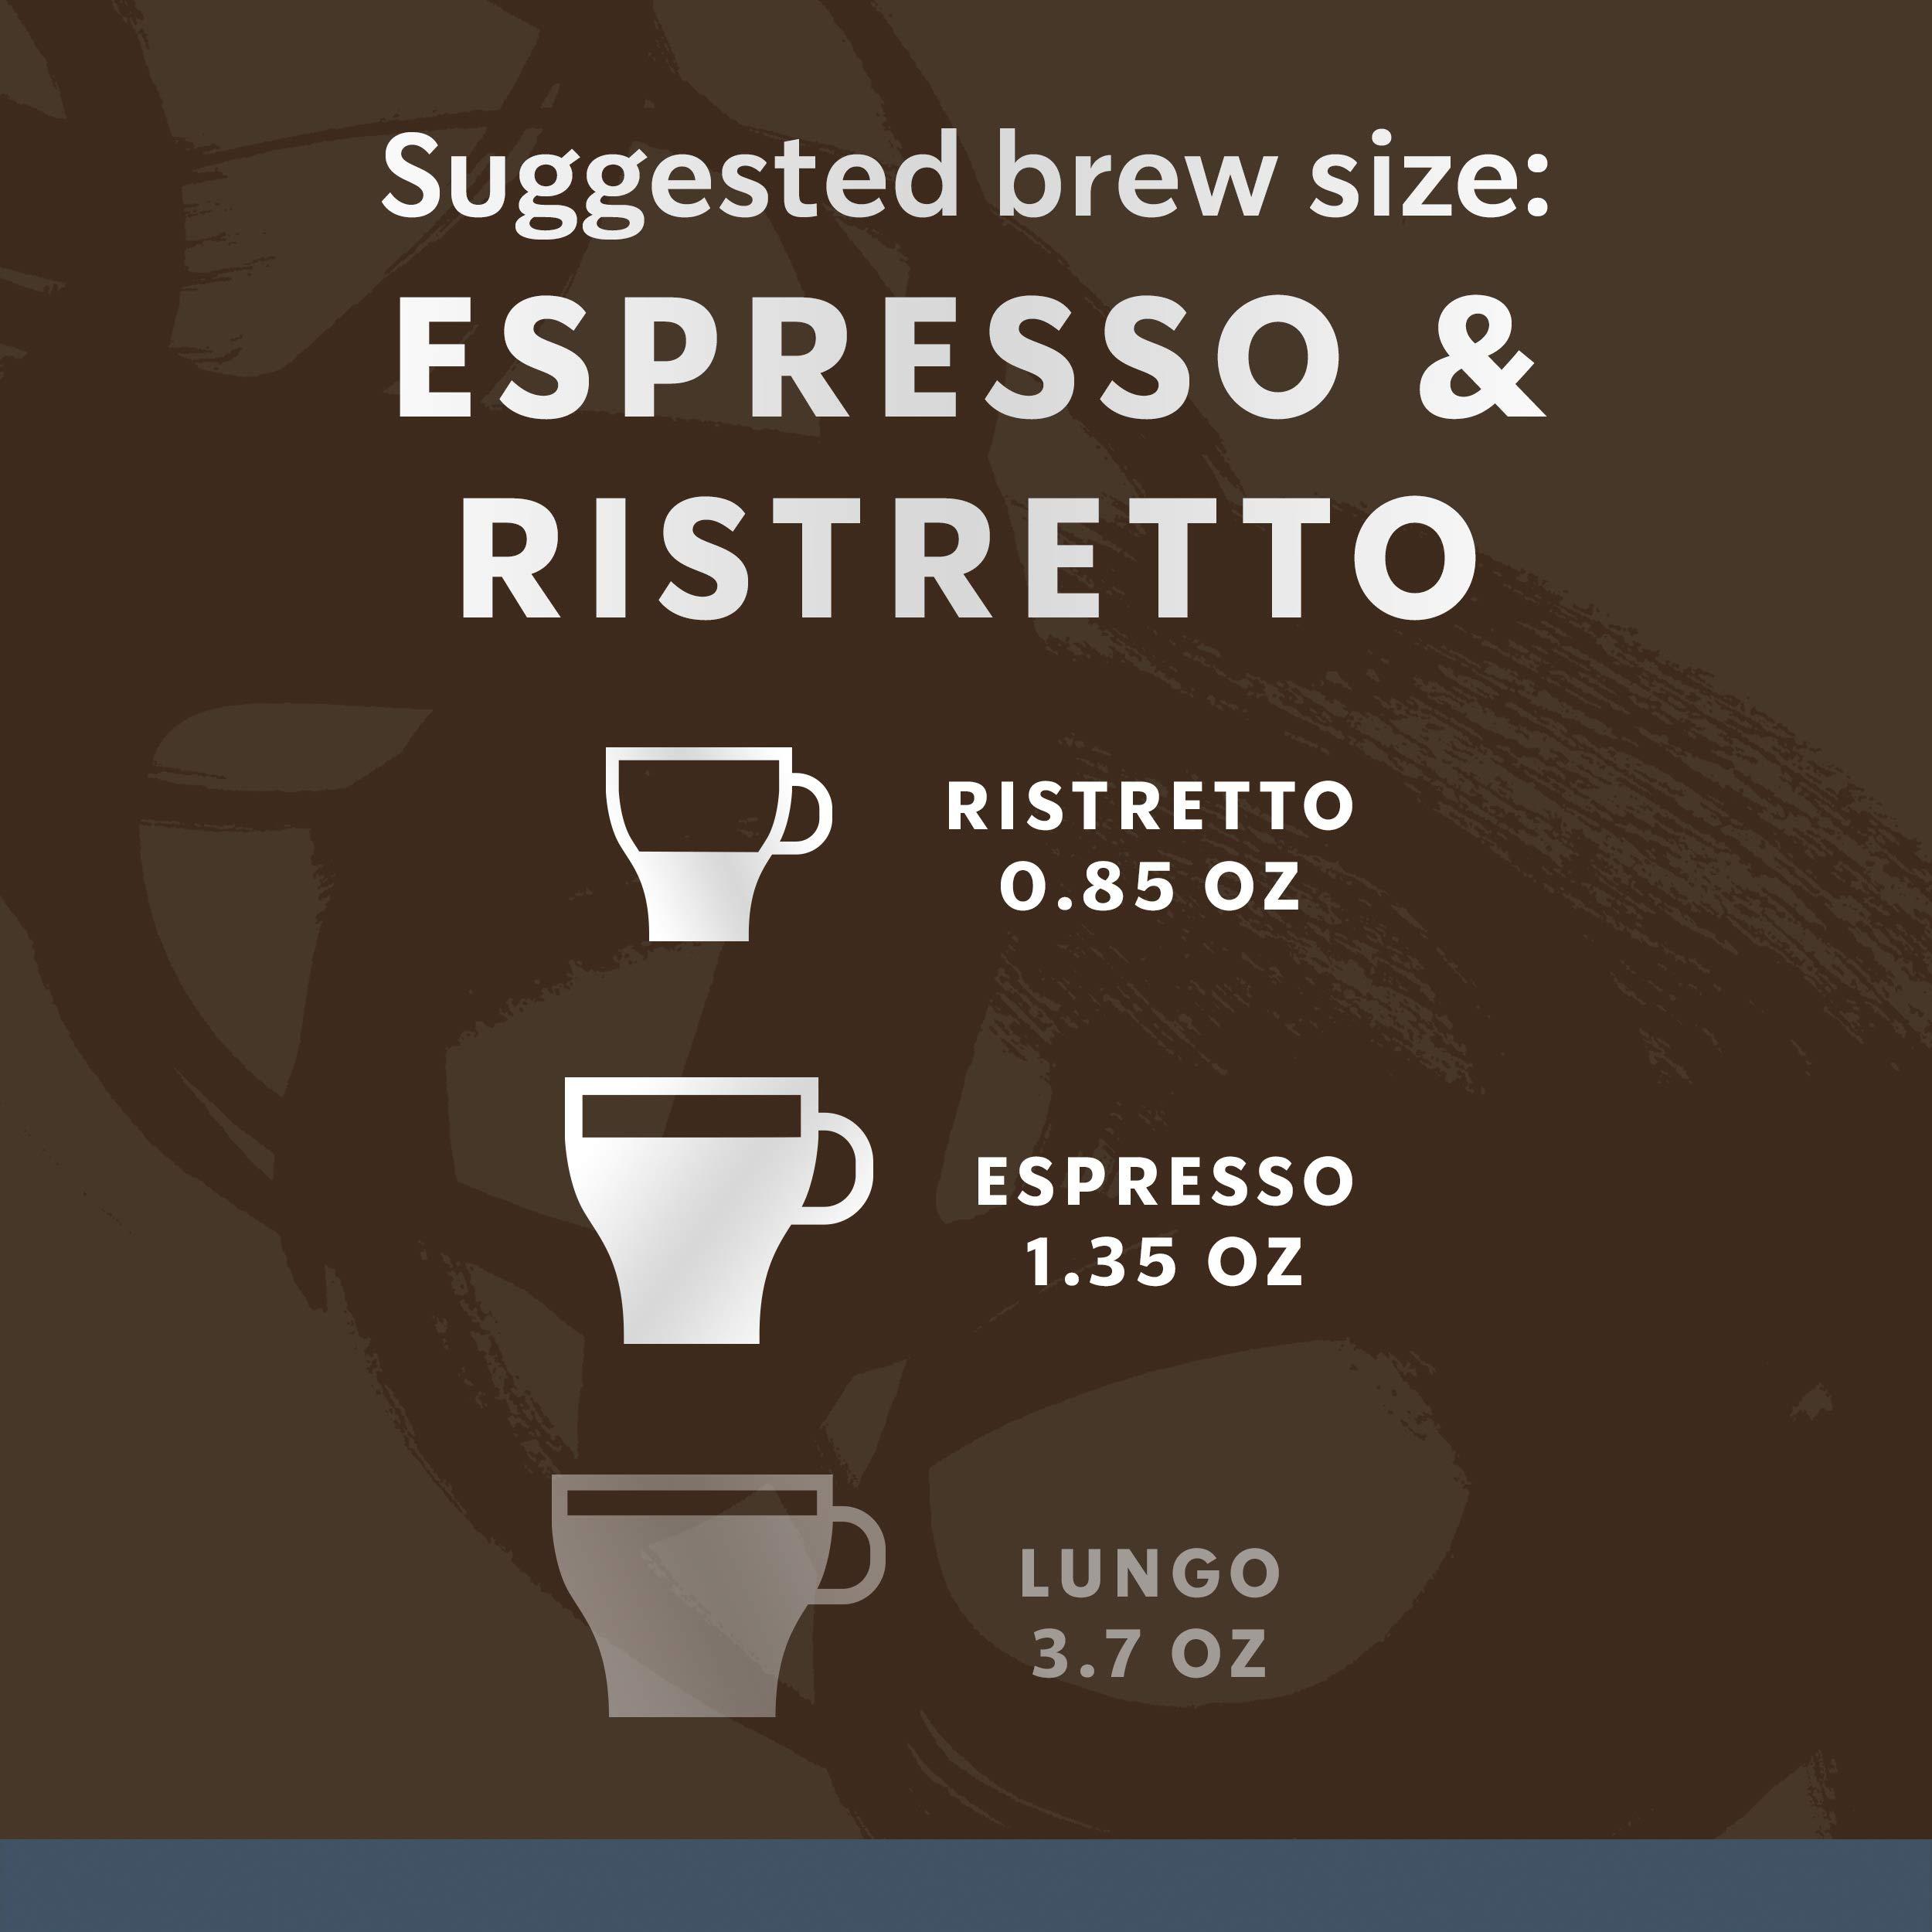 Starbucks by Nespresso, Espresso Dark Roast (50-count single serve capsules, compatible with Nespresso Original Line System) by Starbucks for Nespresso (Image #5)